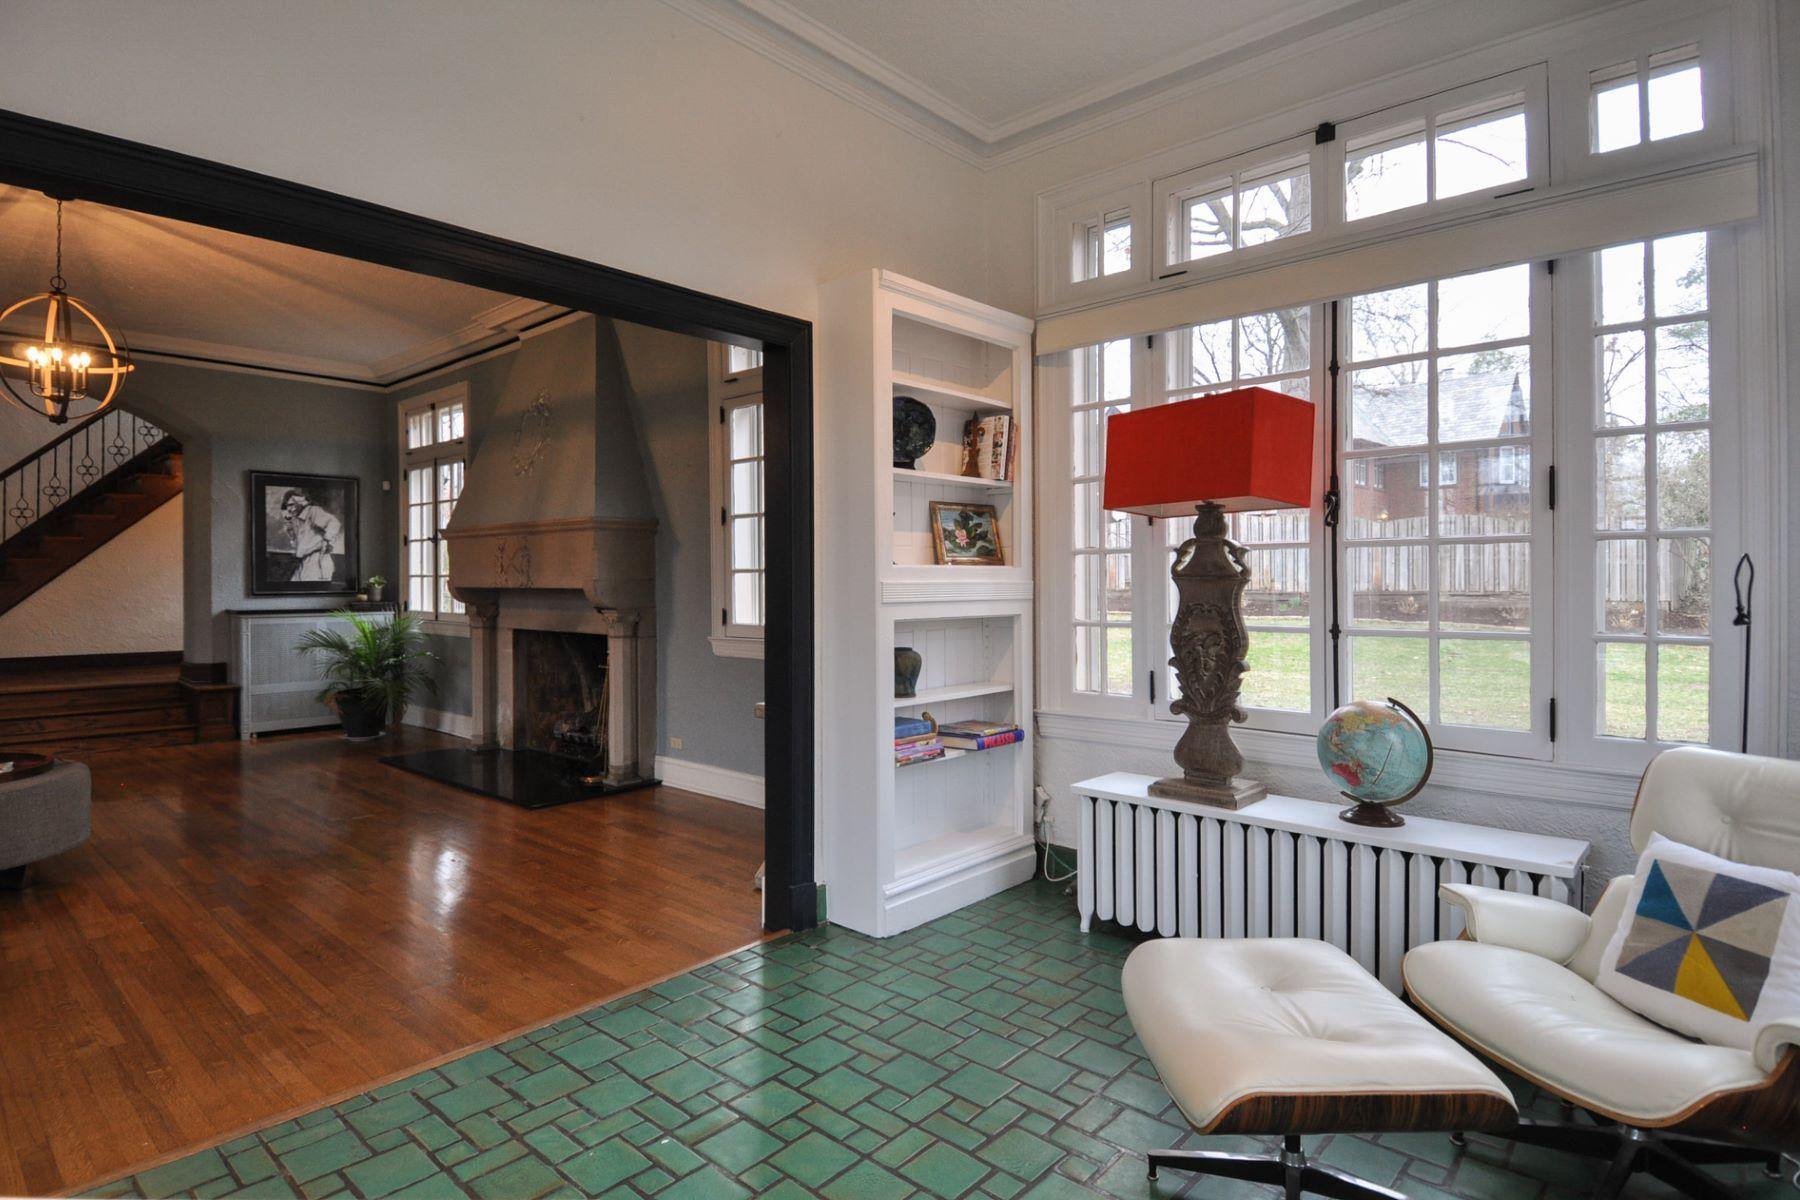 Additional photo for property listing at Italian Renaissance masterpiece 7201 Greenway Avenue University City, Missouri 63130 United States